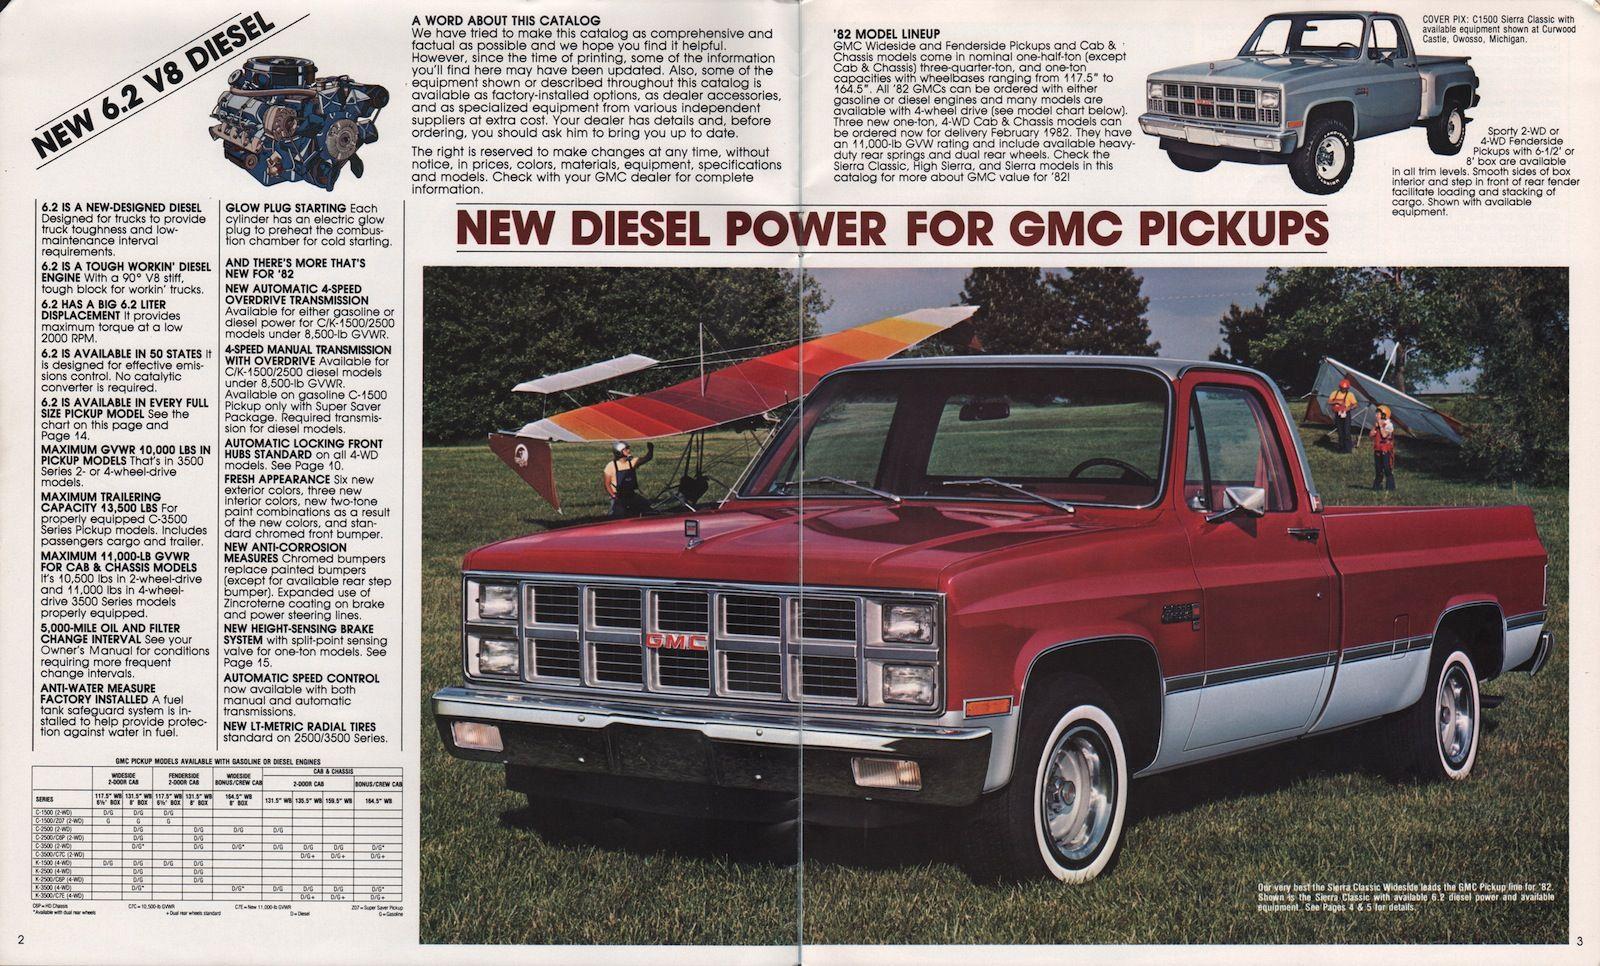 1982 Sierra Classic Wideside Gmc Pickup Gmc Gmc Diesel